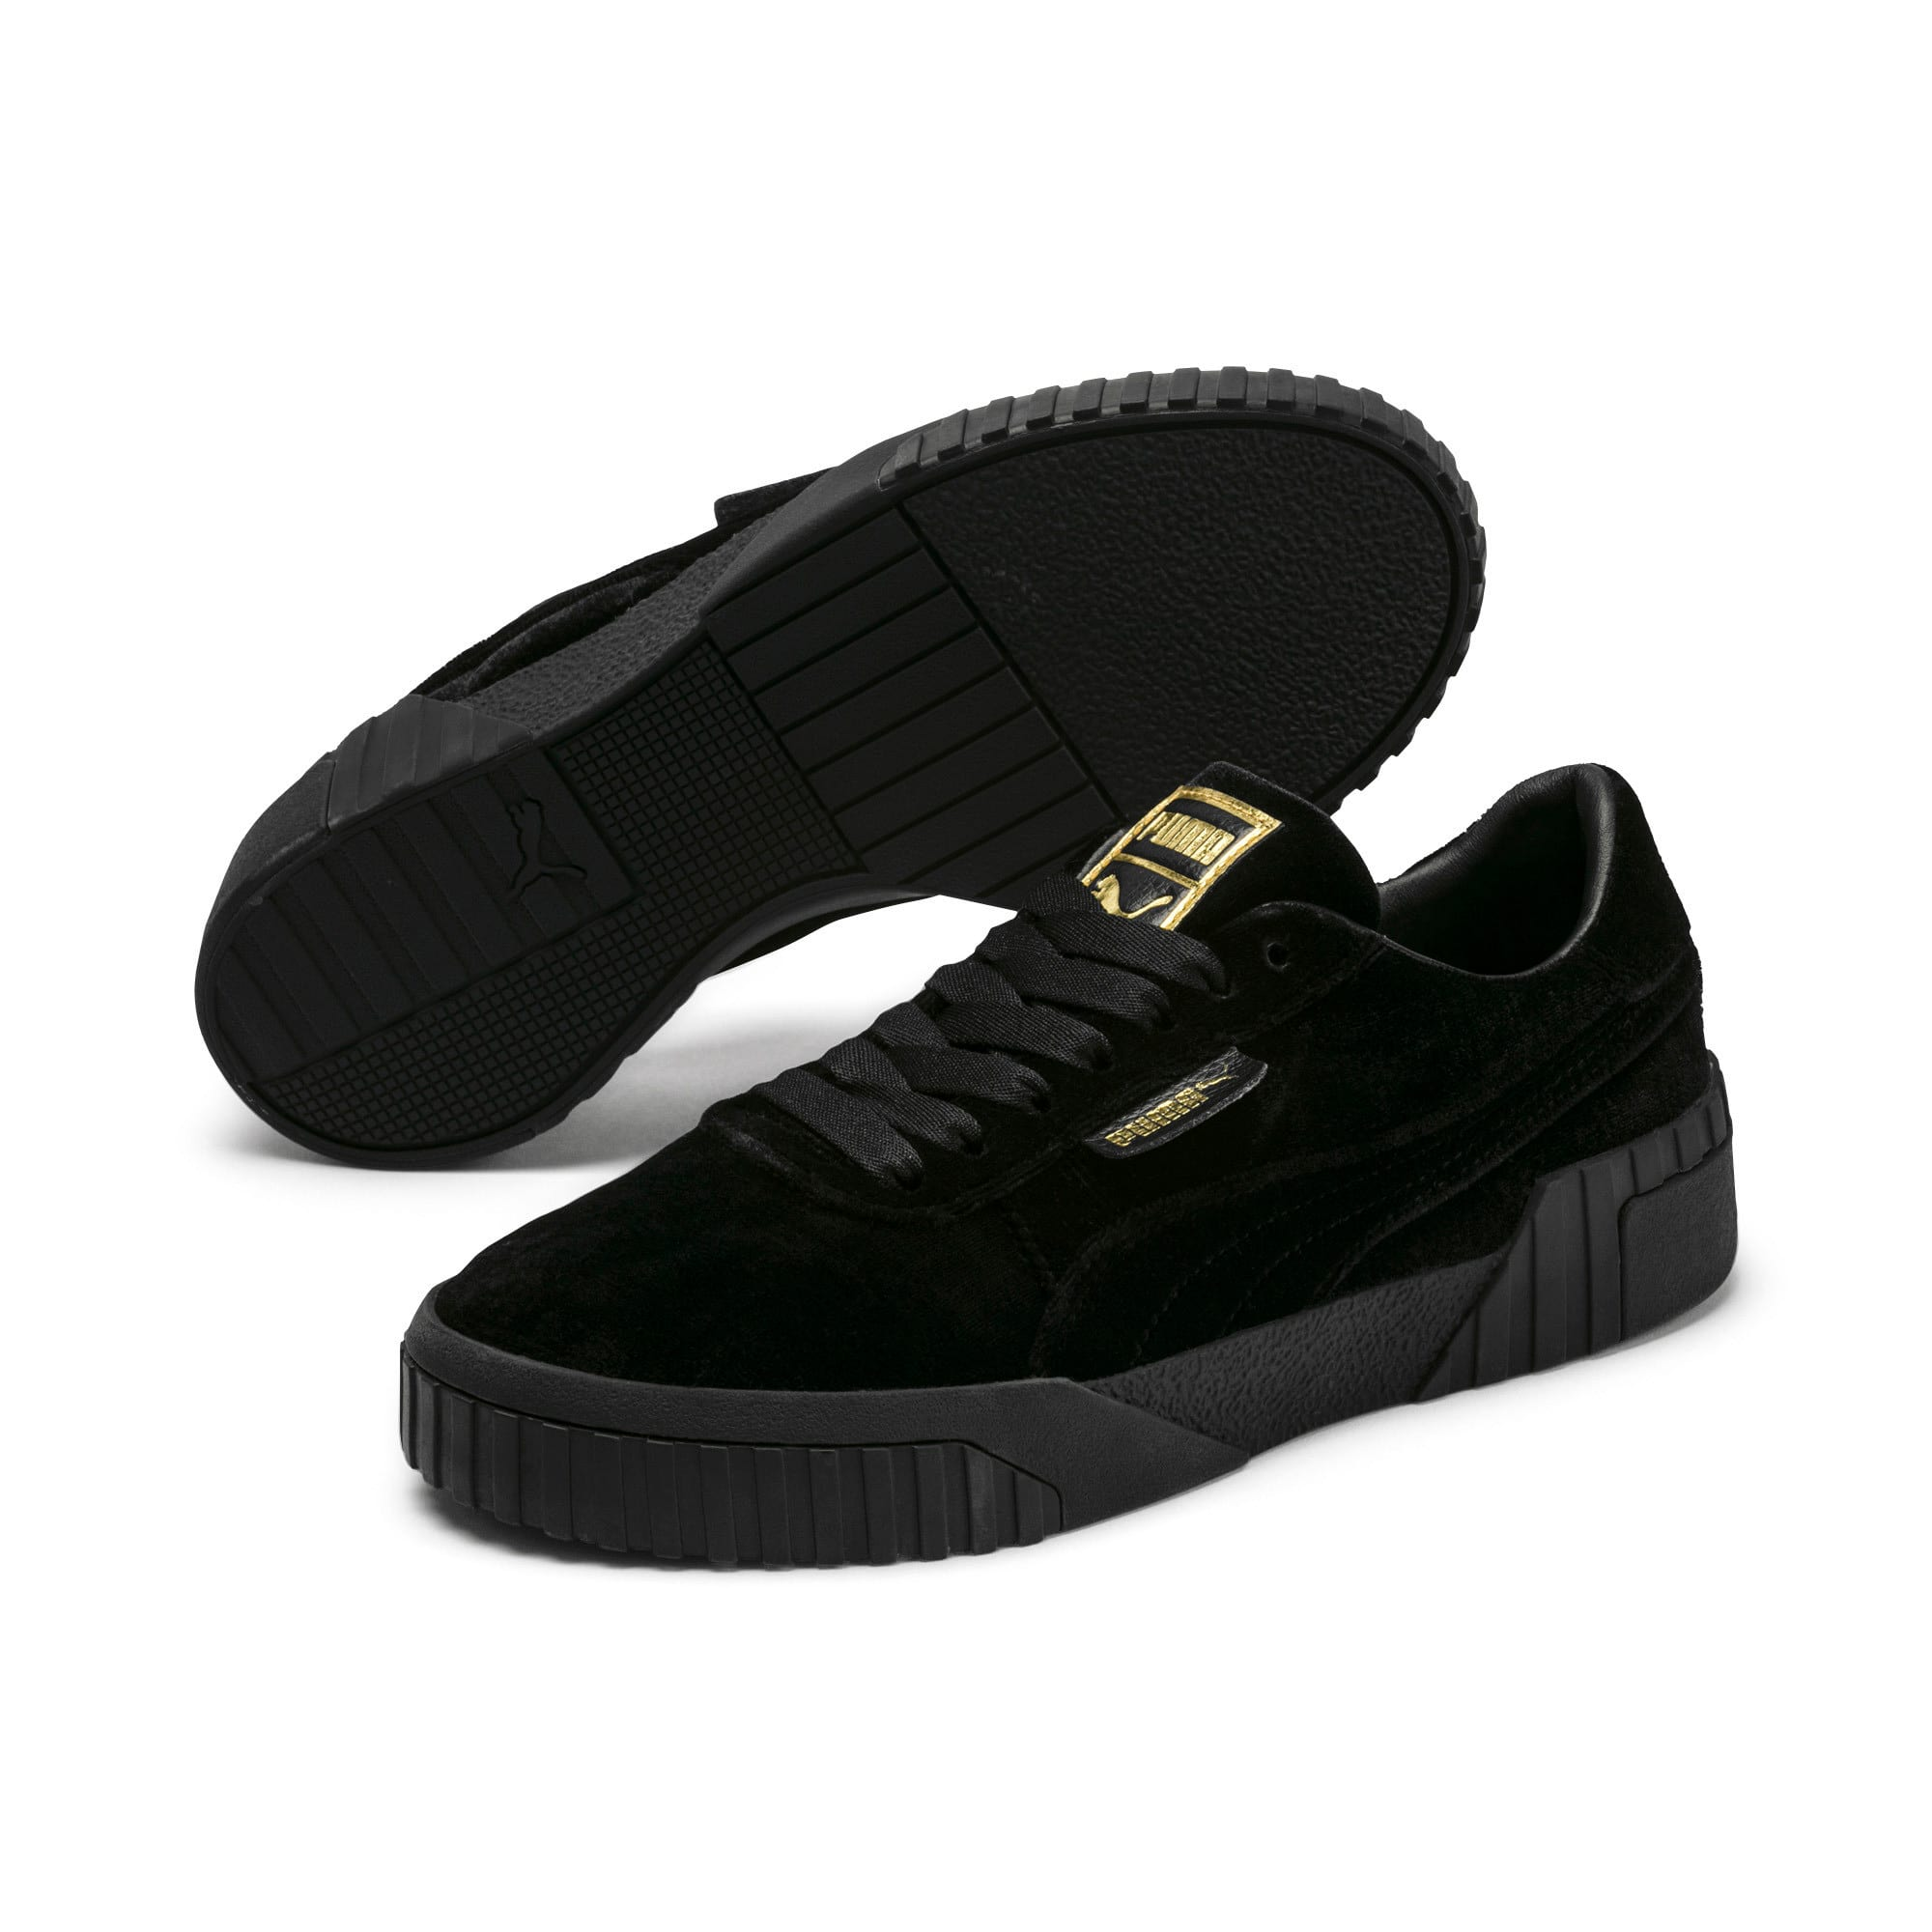 Thumbnail 2 of Cali Velvet Women's Sneakers, Puma Black-Puma Black, medium